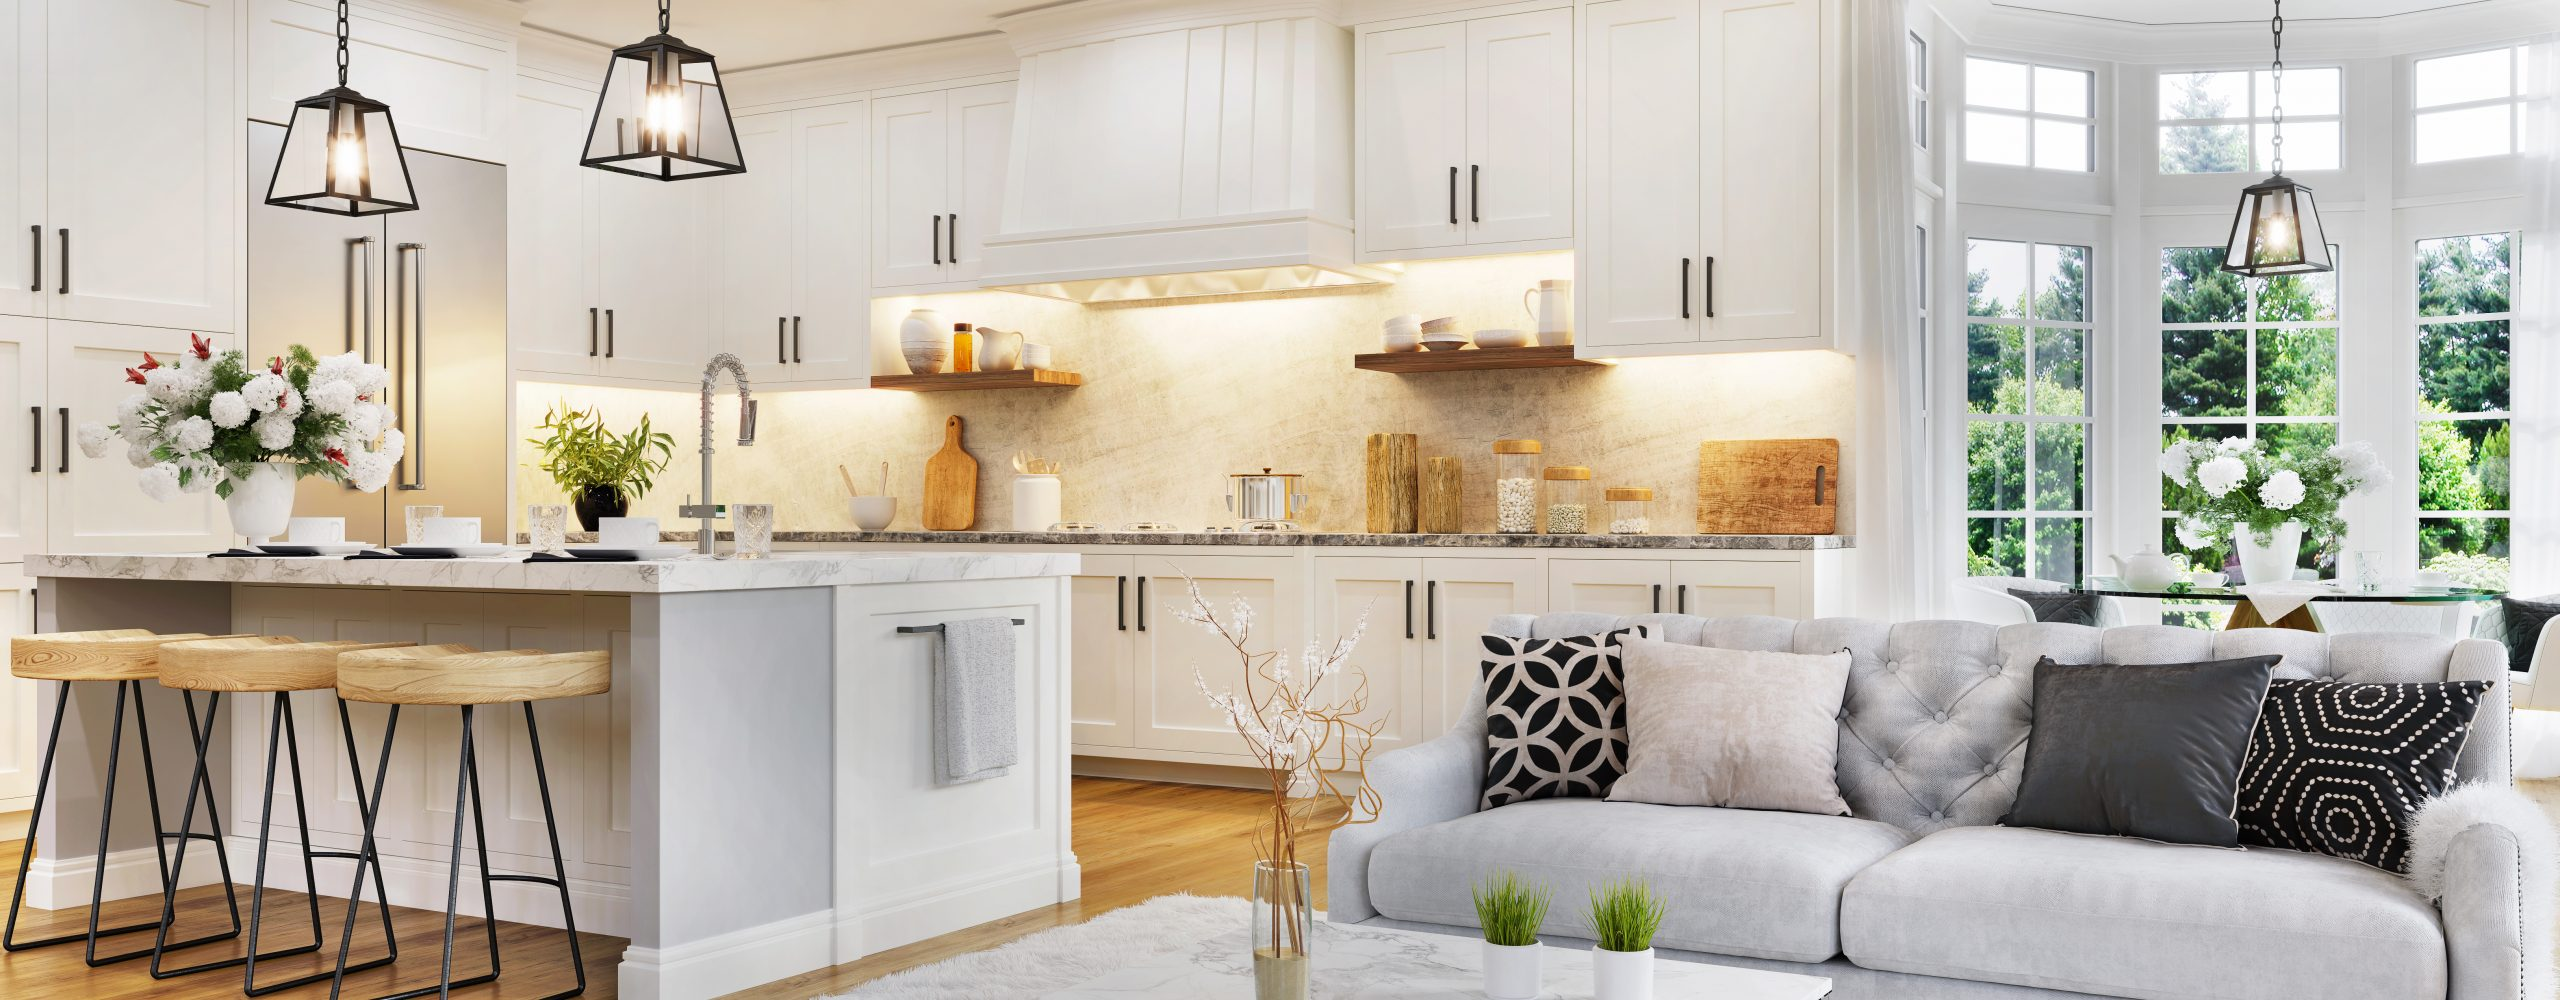 interior designer fort wayne